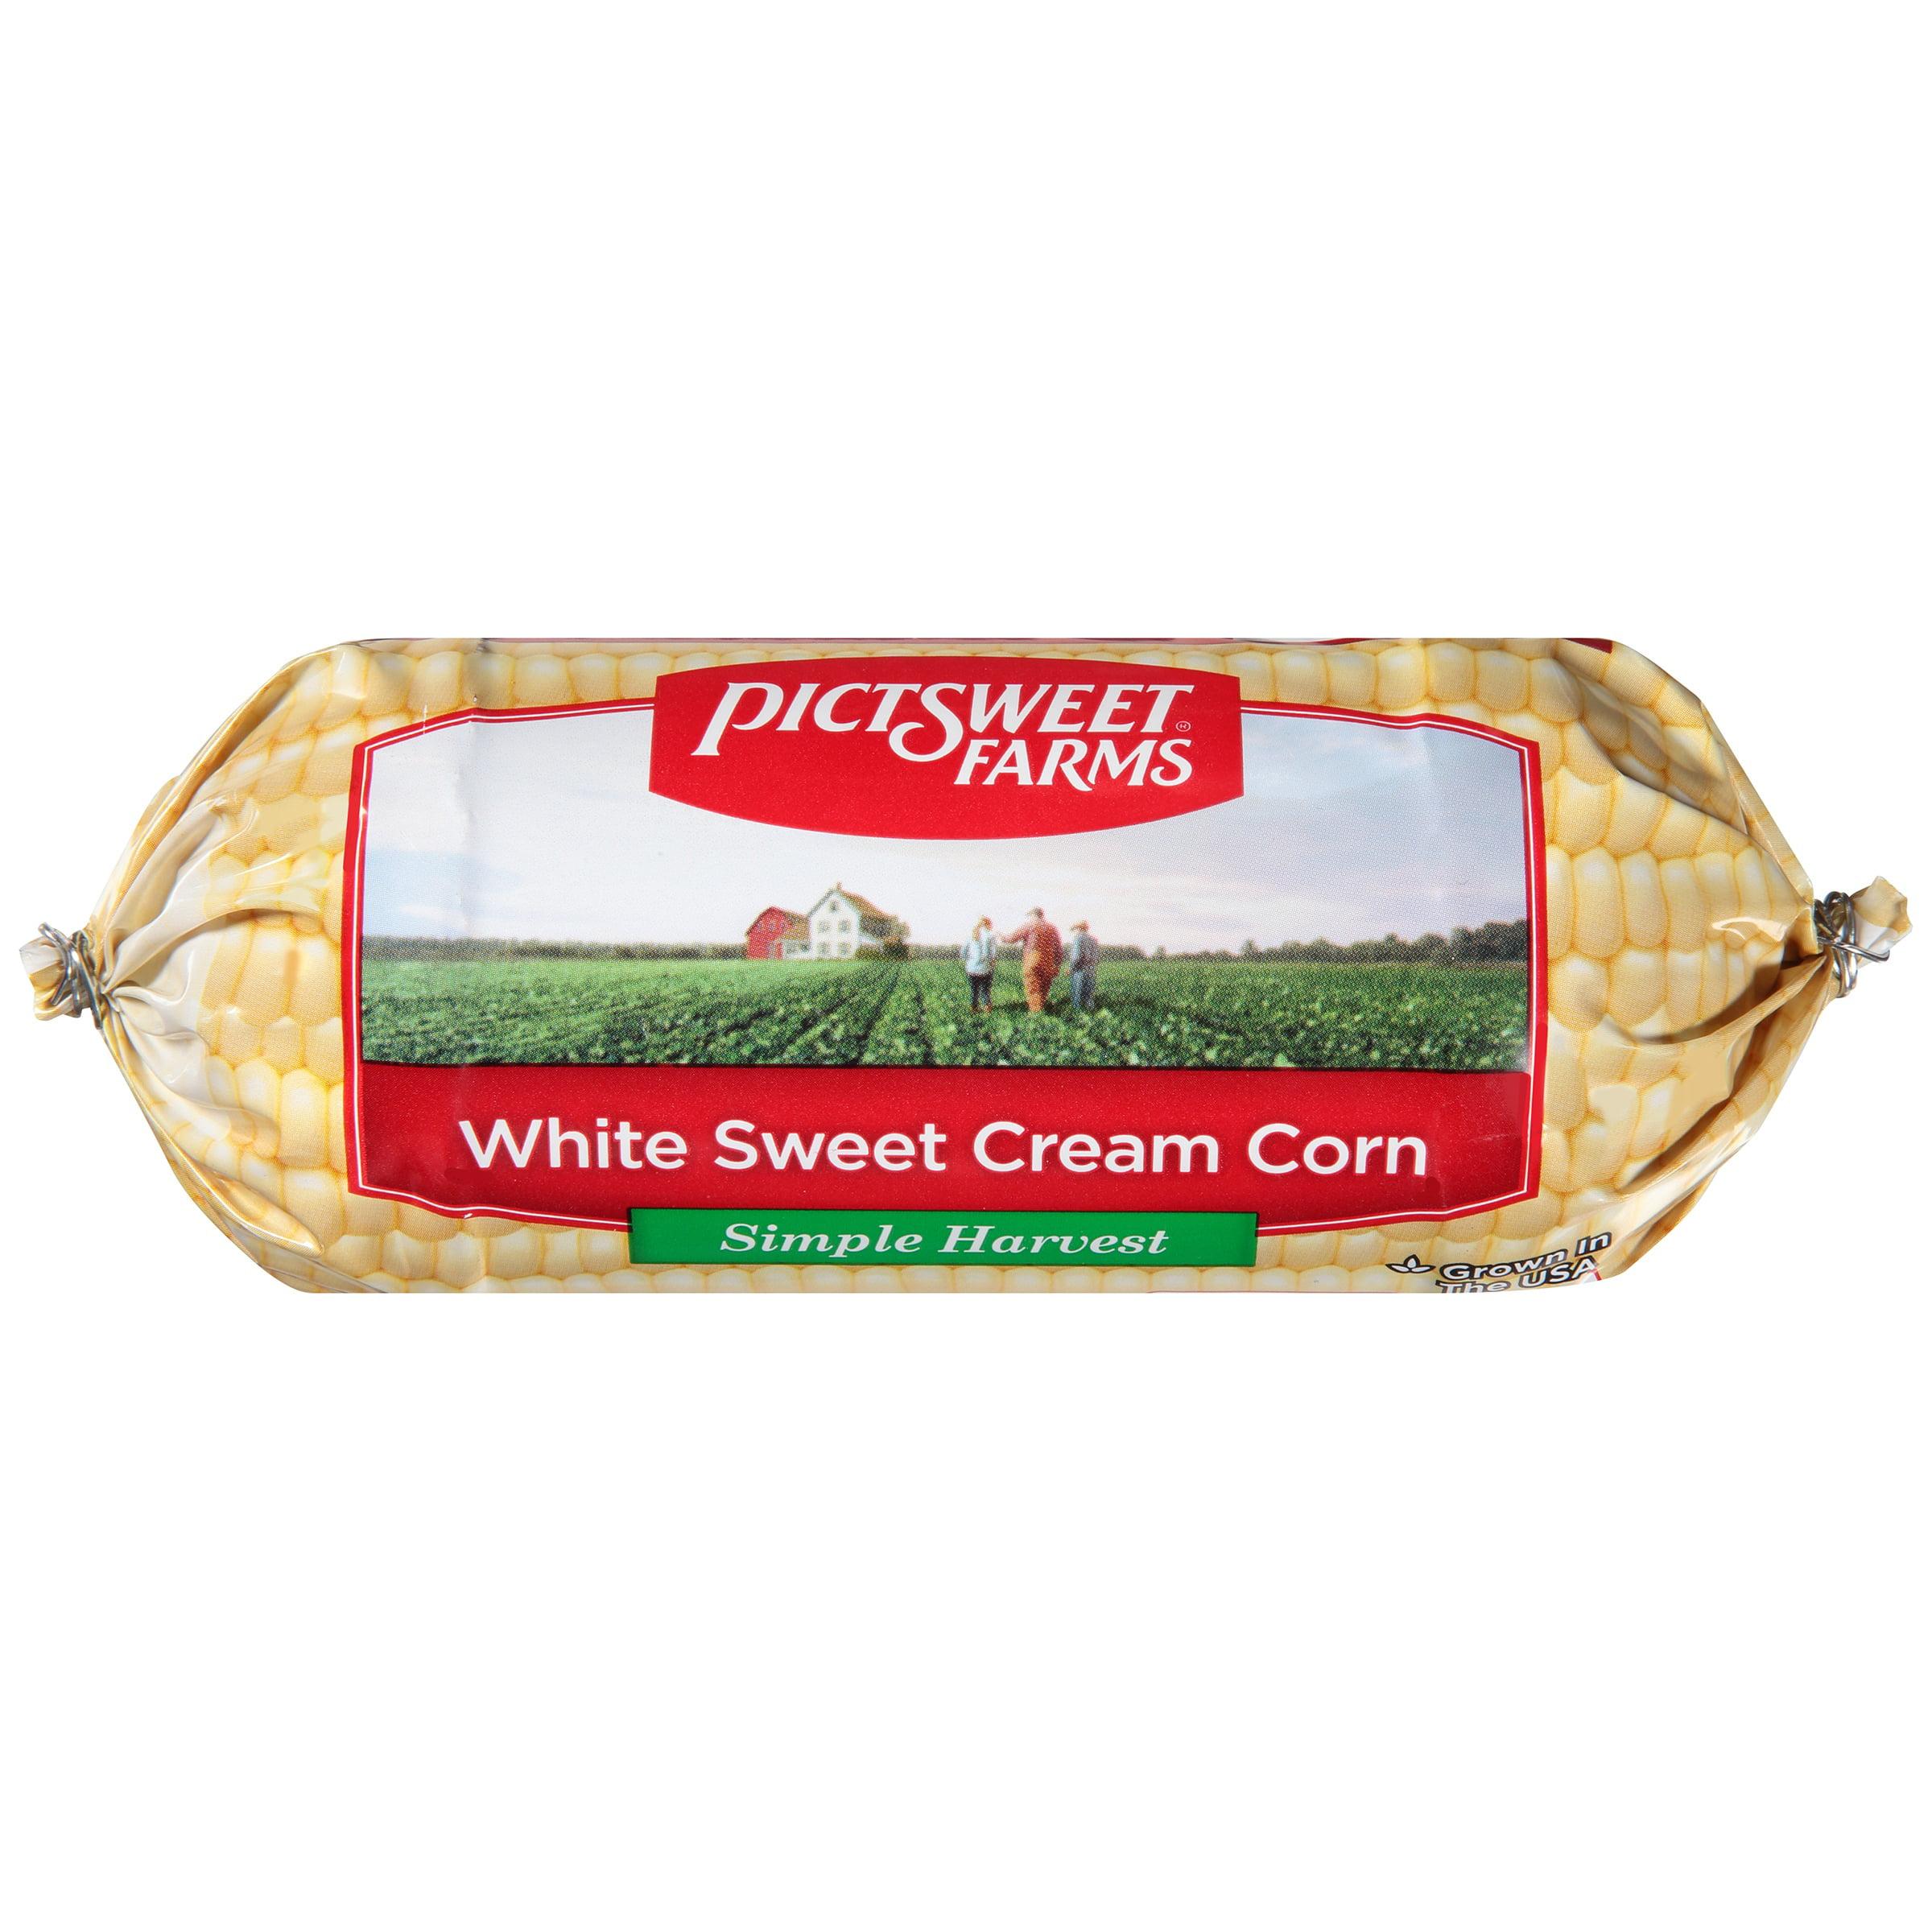 Pictsweet Farms® Simple Harvest White Sweet Cream Corn